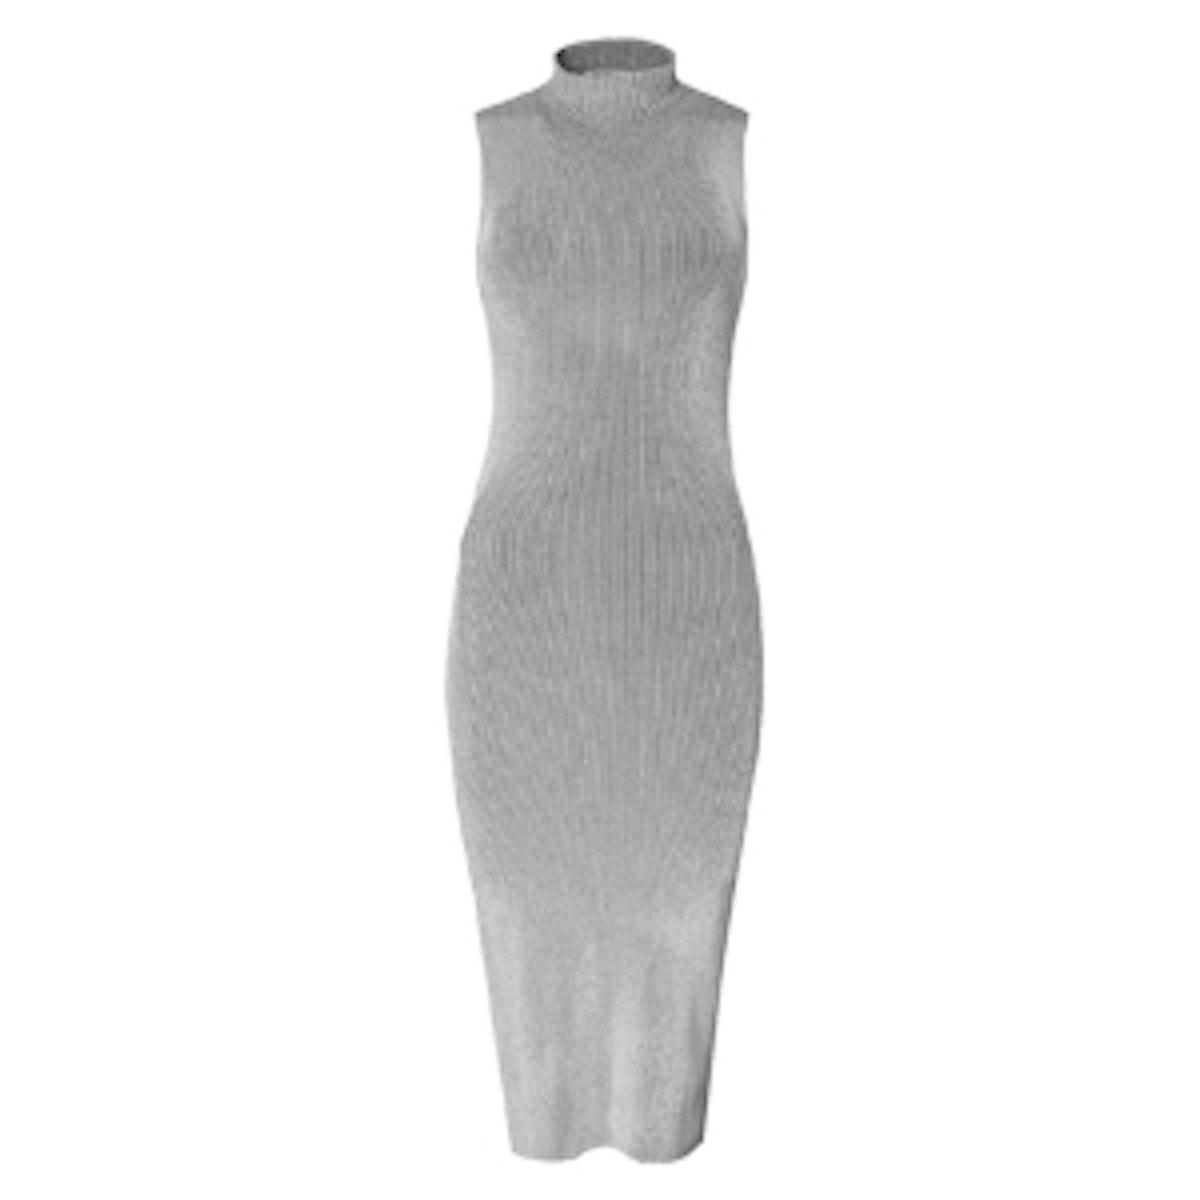 Sleeveless Ribbed Openback Dress